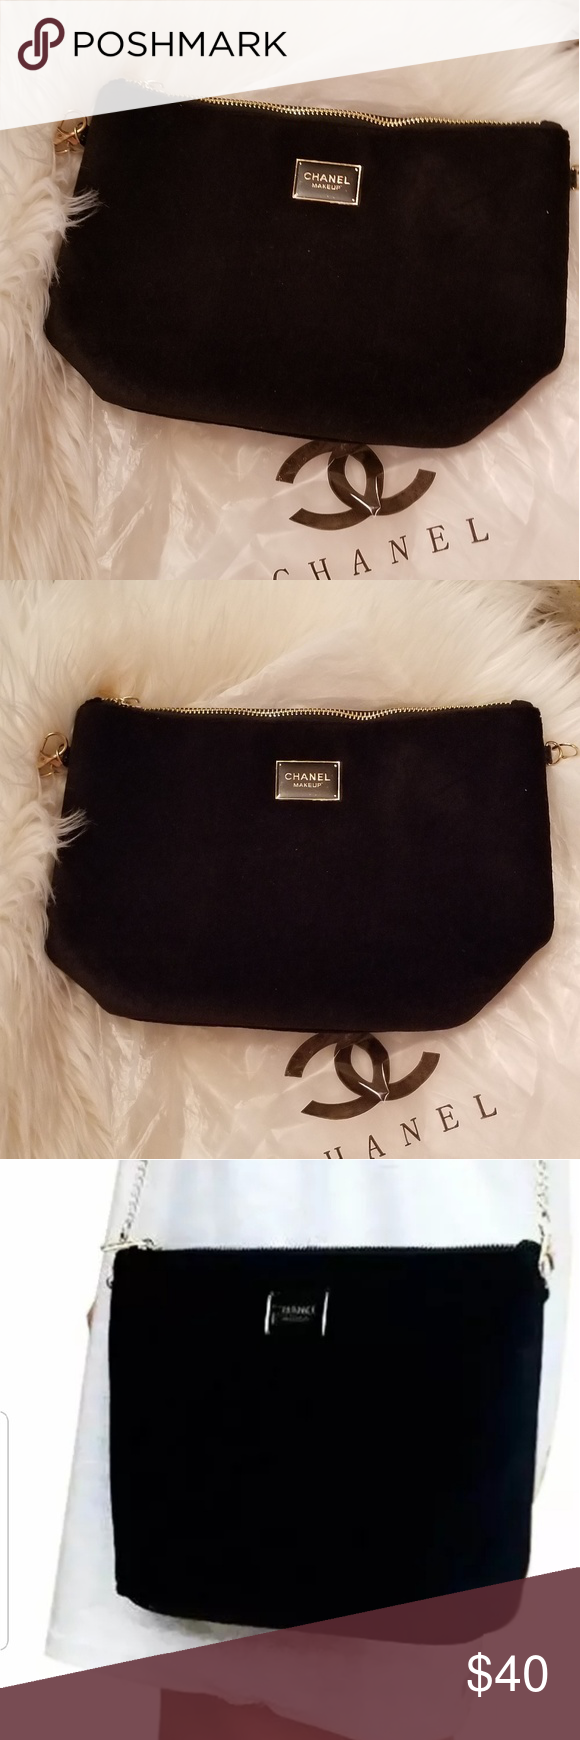 CHANEL Black Velvet Zip Makeup Bag Makeup bag, Chanel